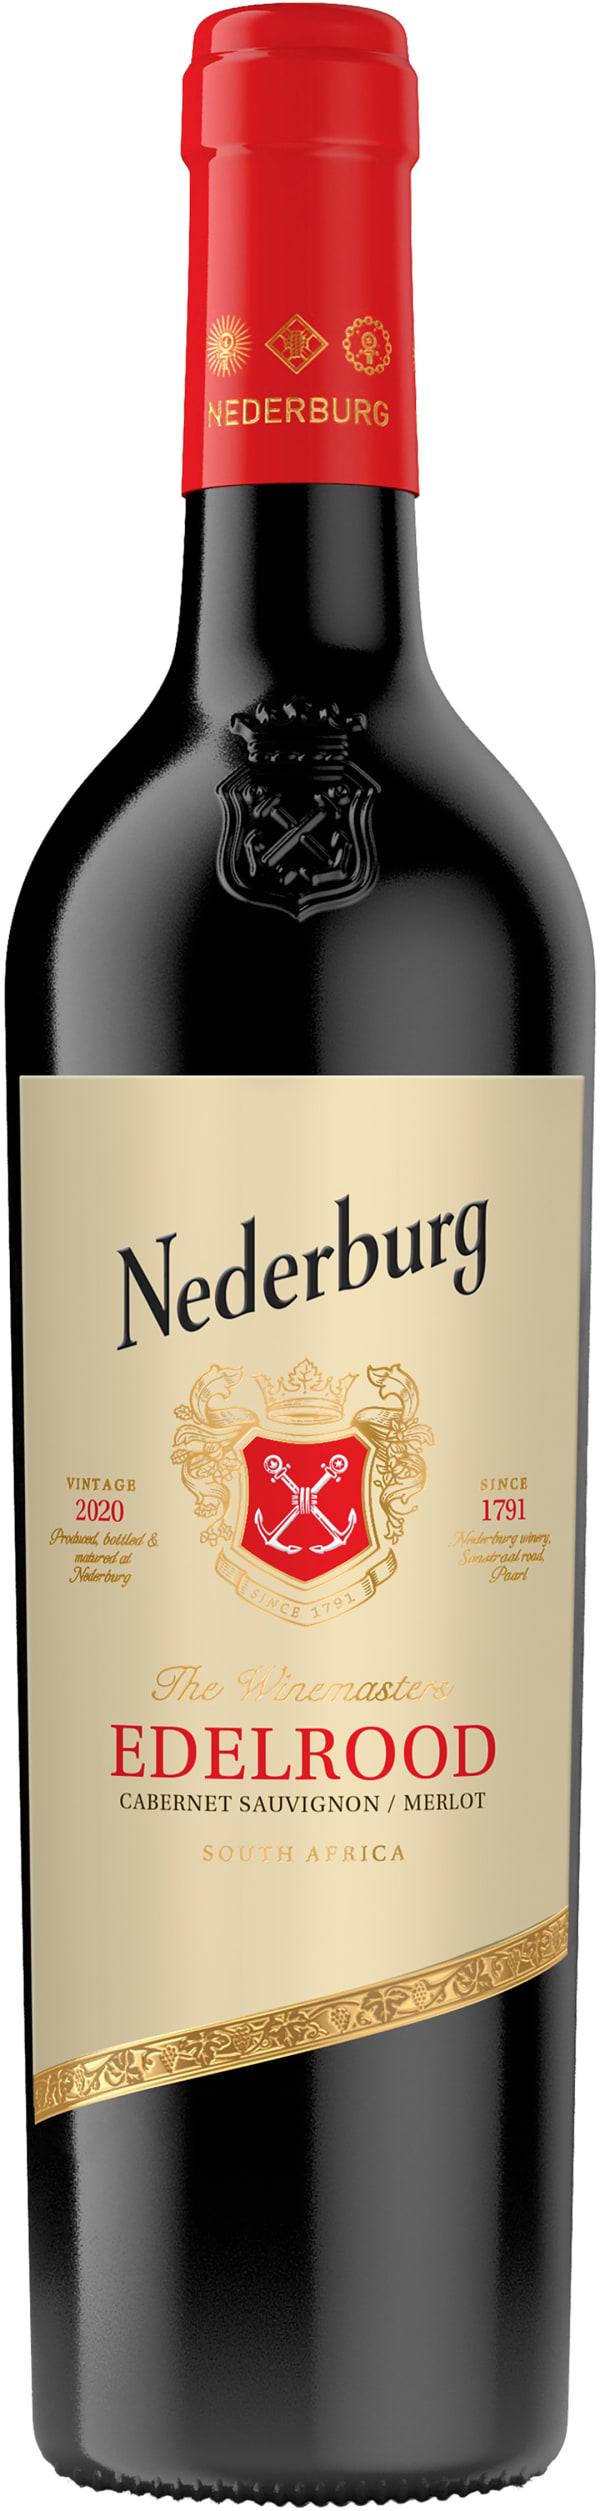 Nederburg Edelrood 2019